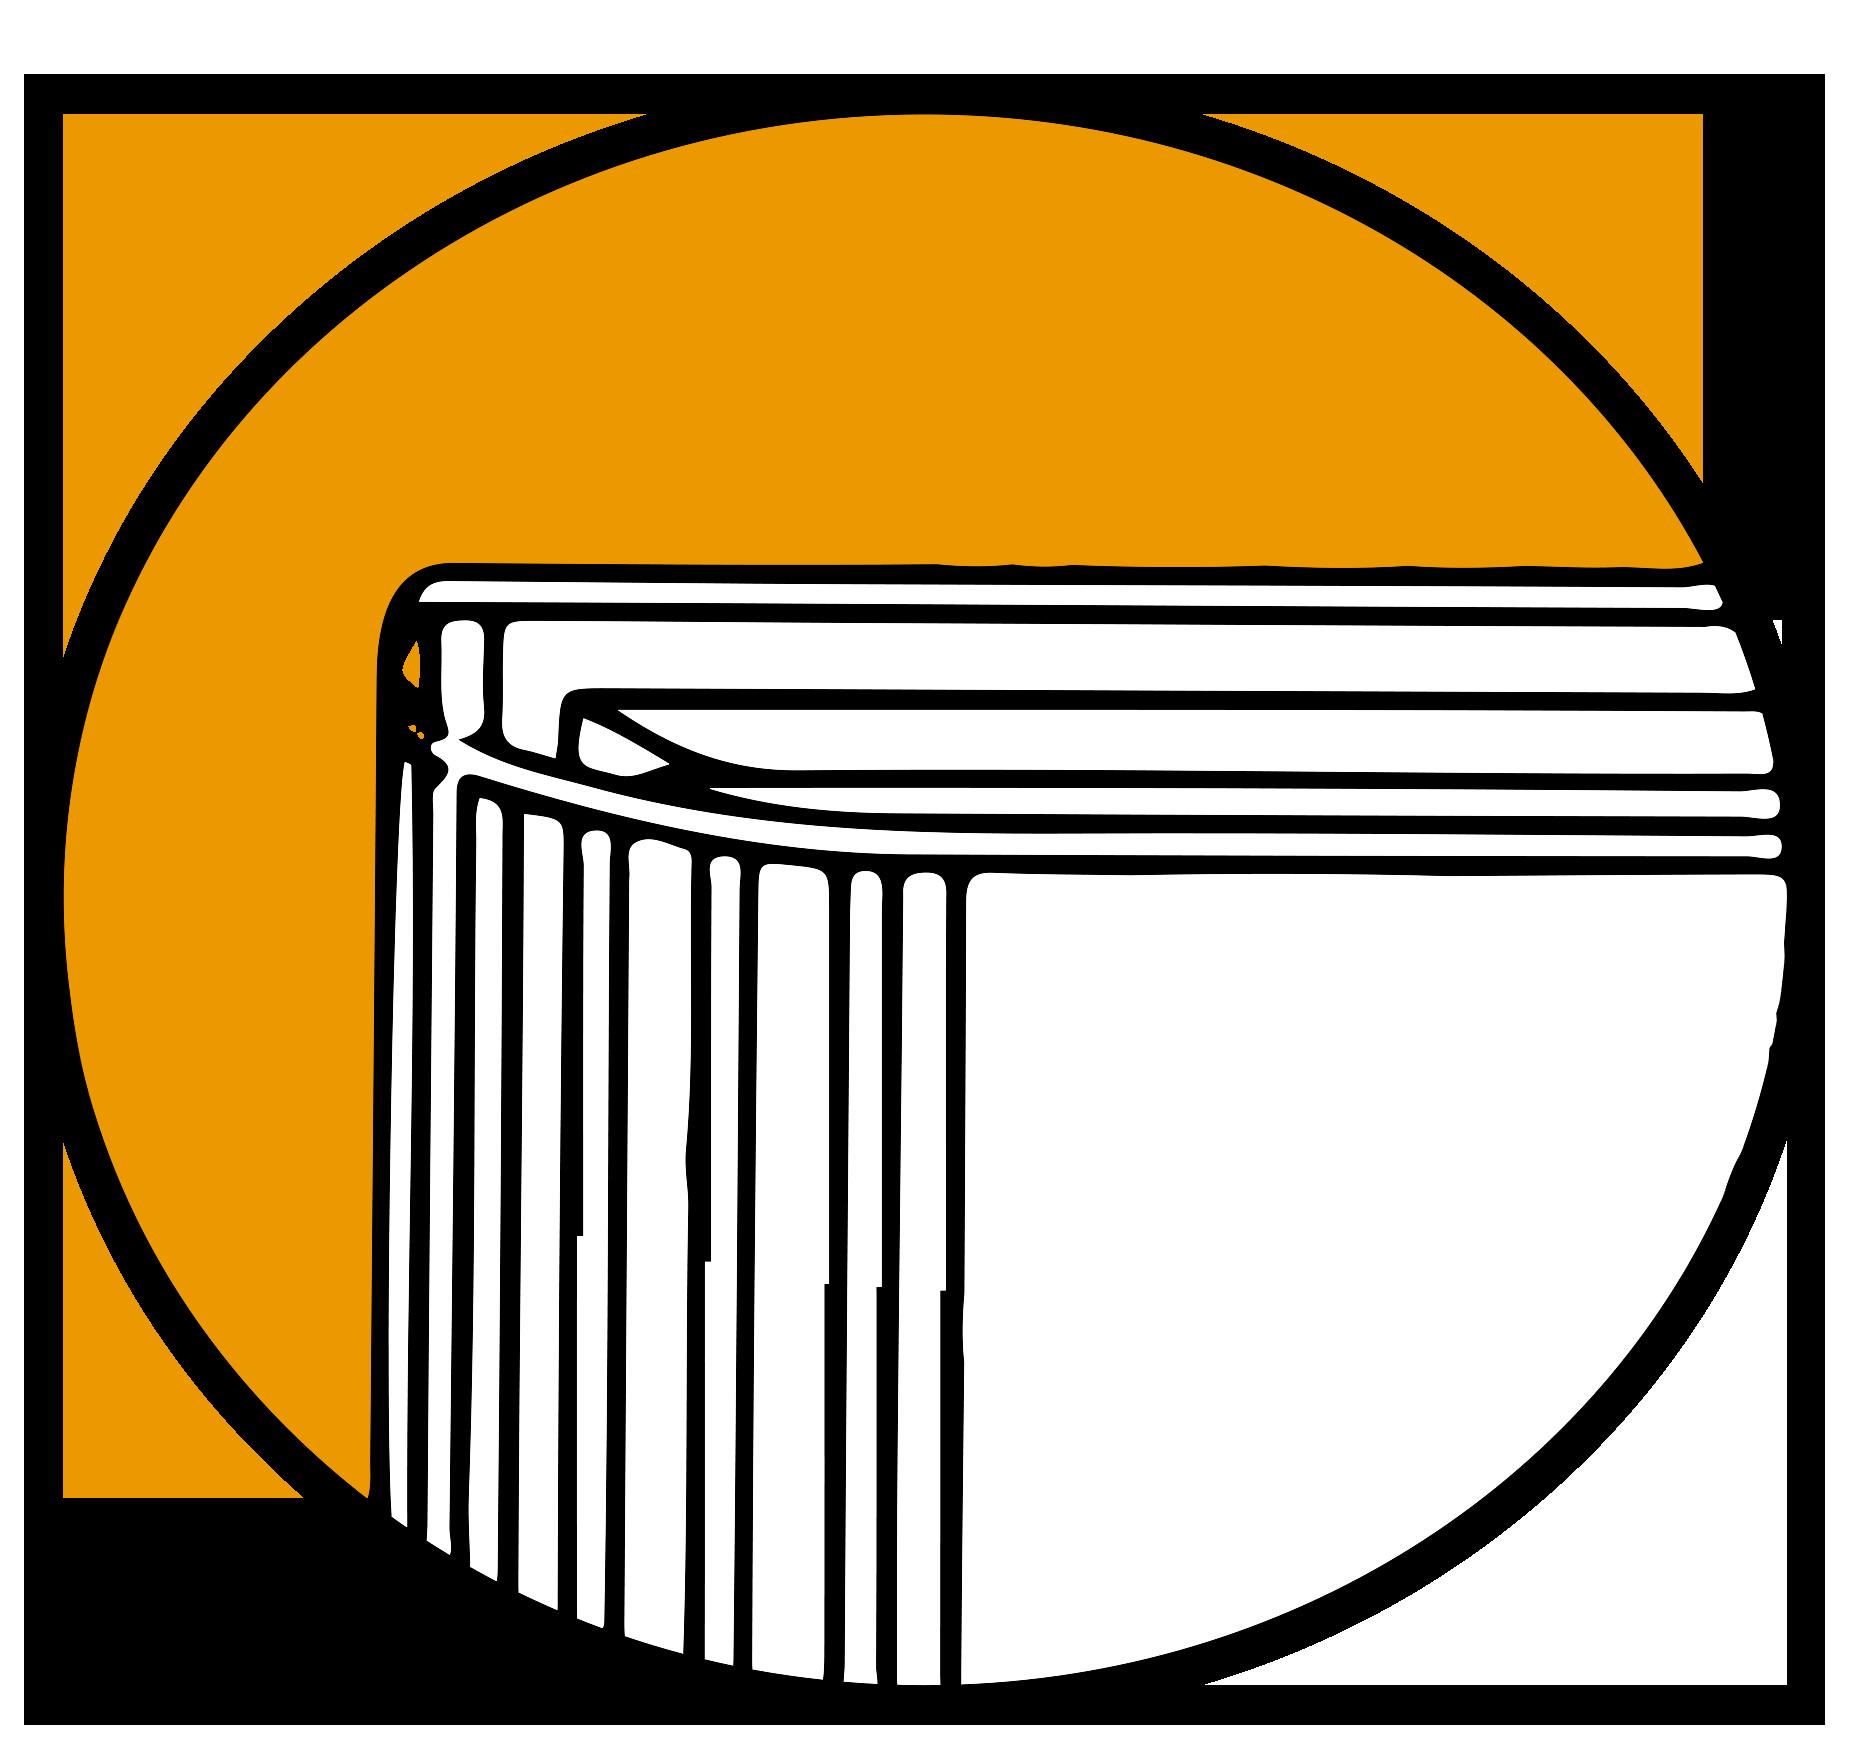 multimedia-packaging-overlap interlockribbed-spine